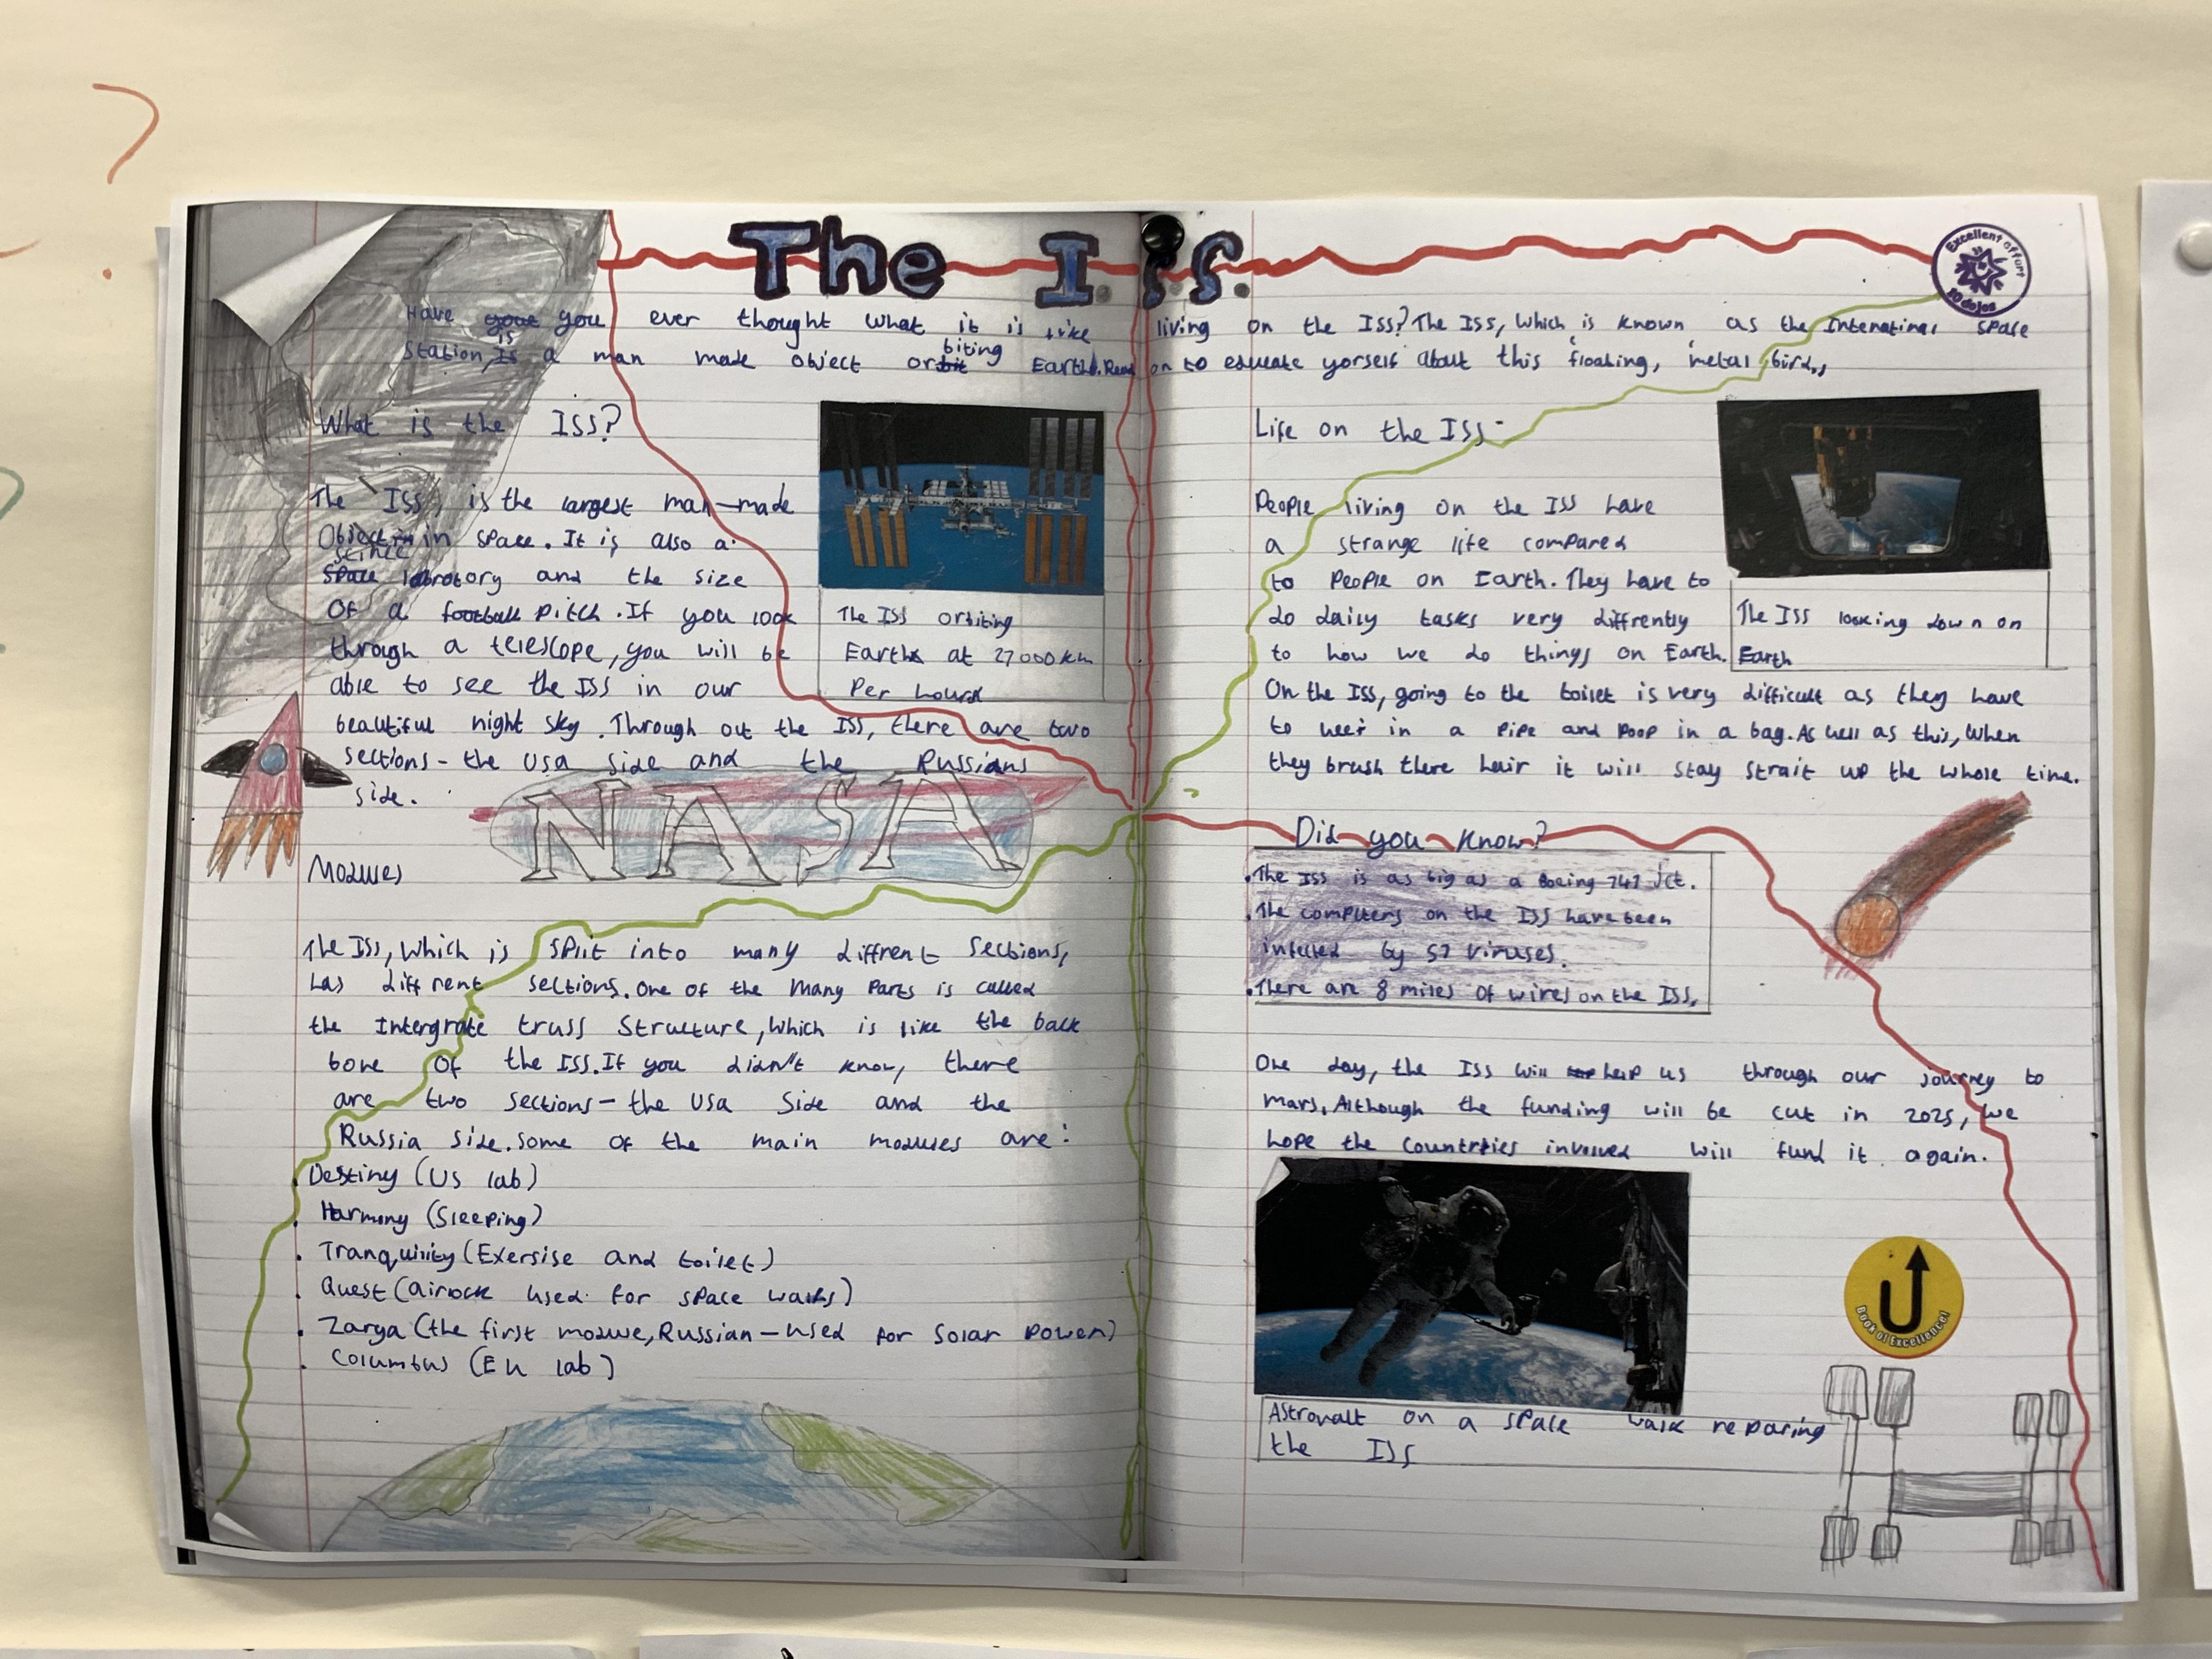 Jager's excellent report!